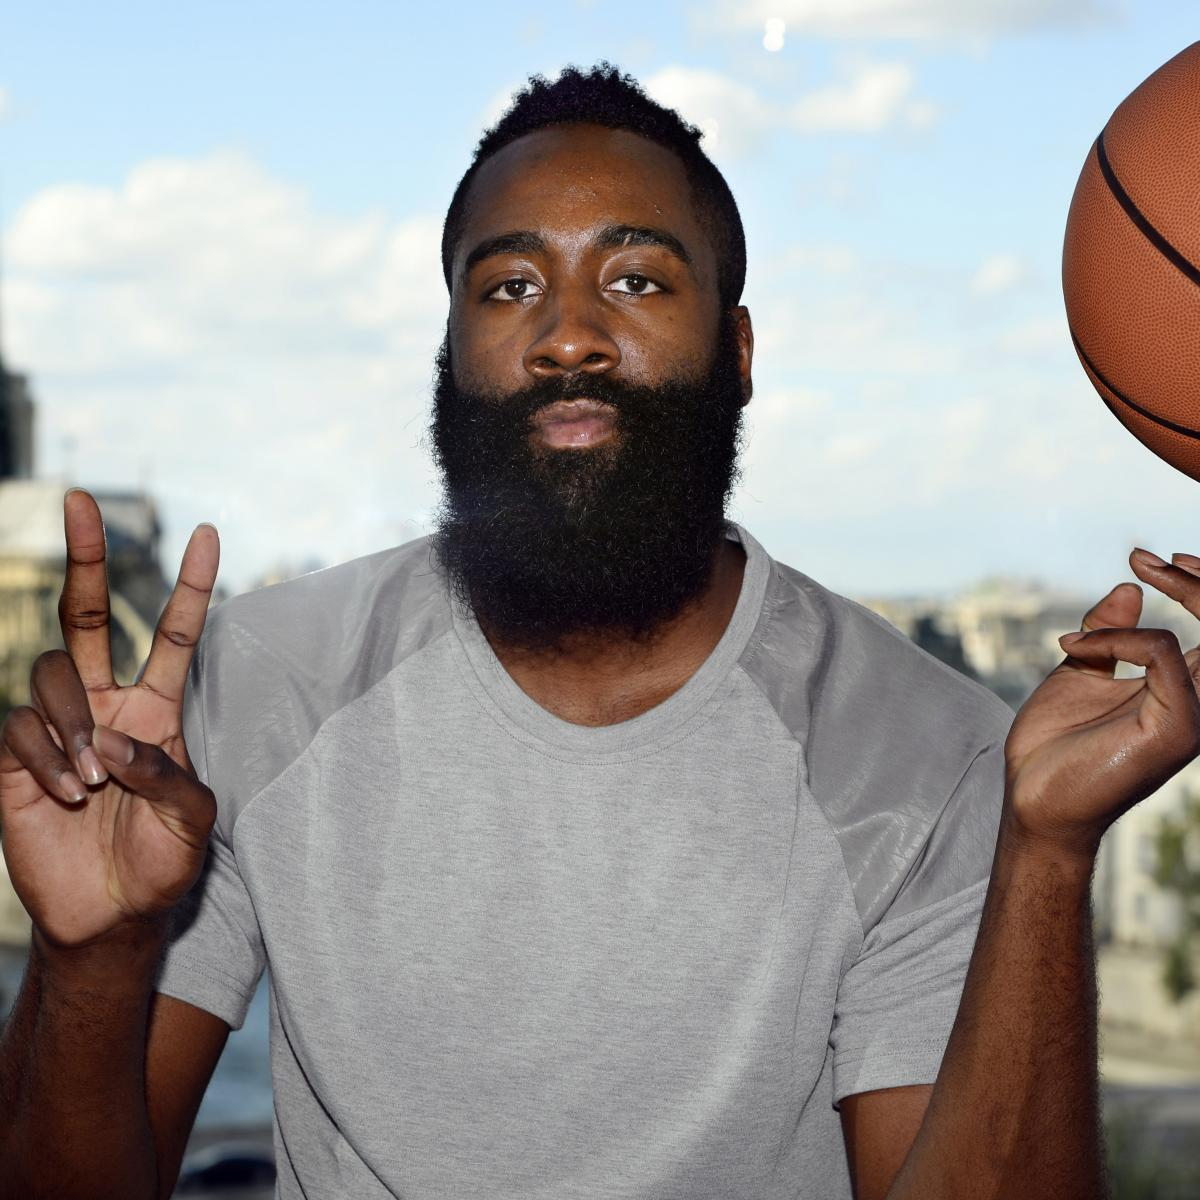 Houston Rockets 3rd Quarter Stats: Houston Rockets Notebook: James Harden's Plan To Shut Up